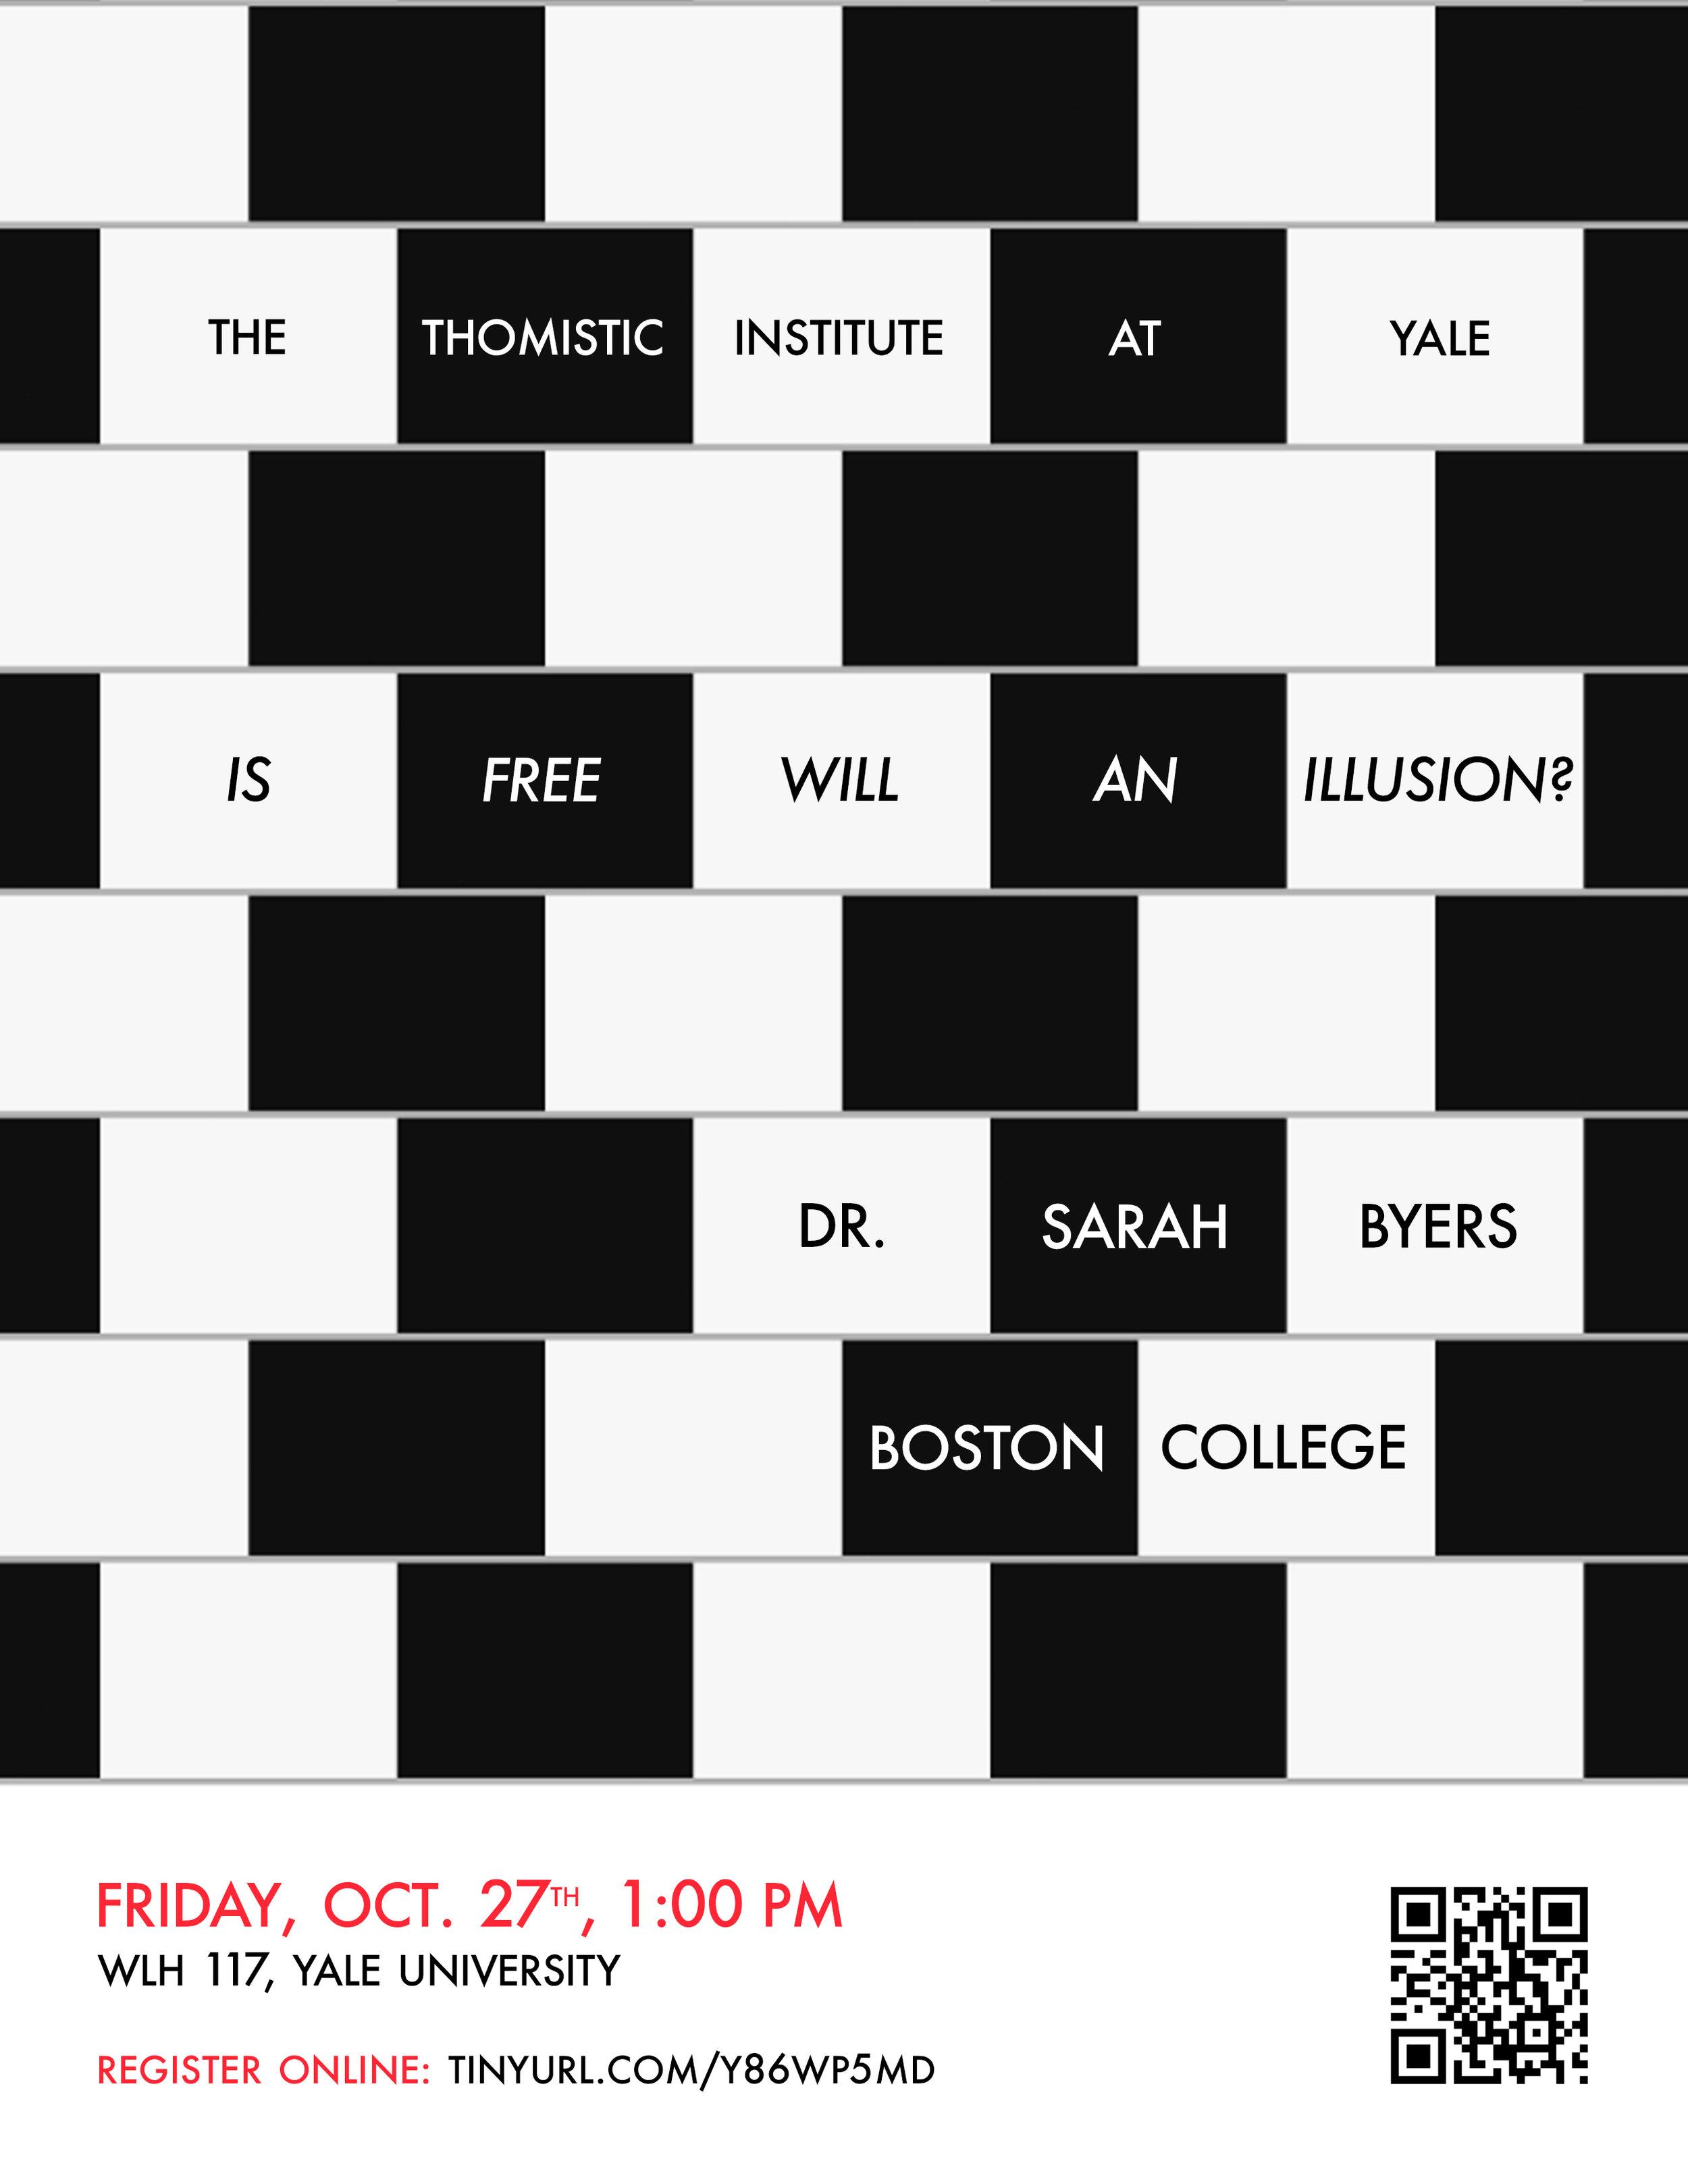 TI-Oct27-Yale (original).jpg